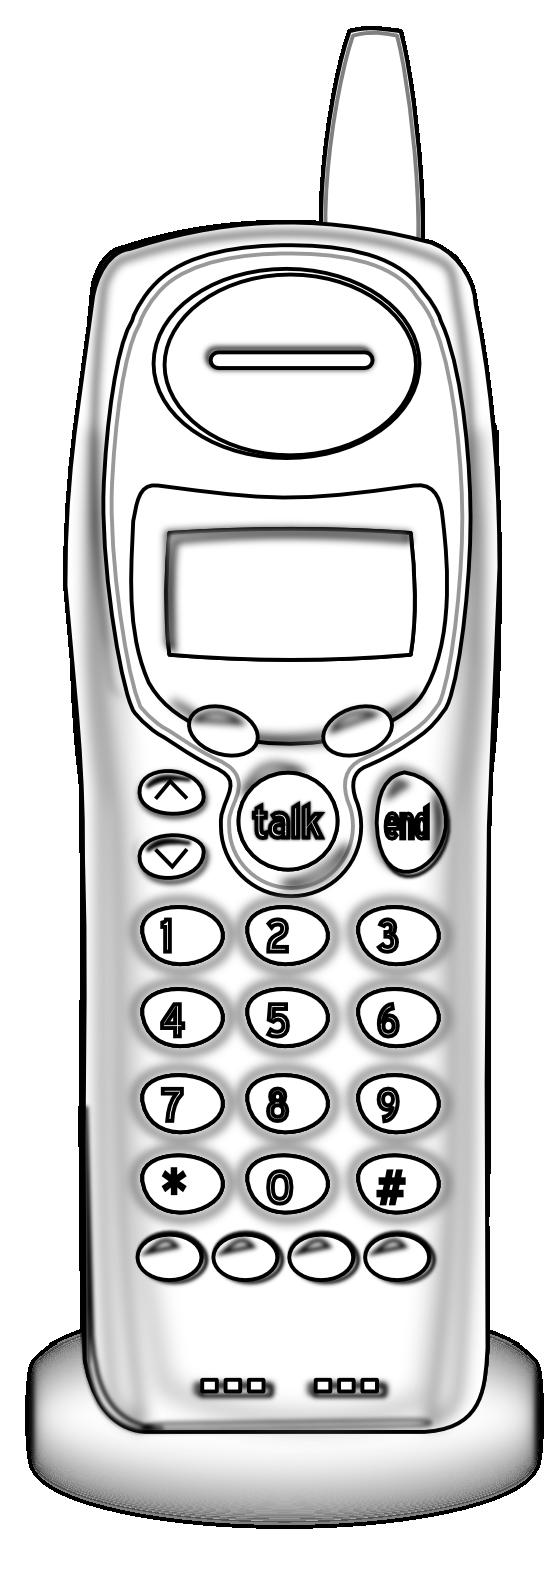 Cordless phone clipart.